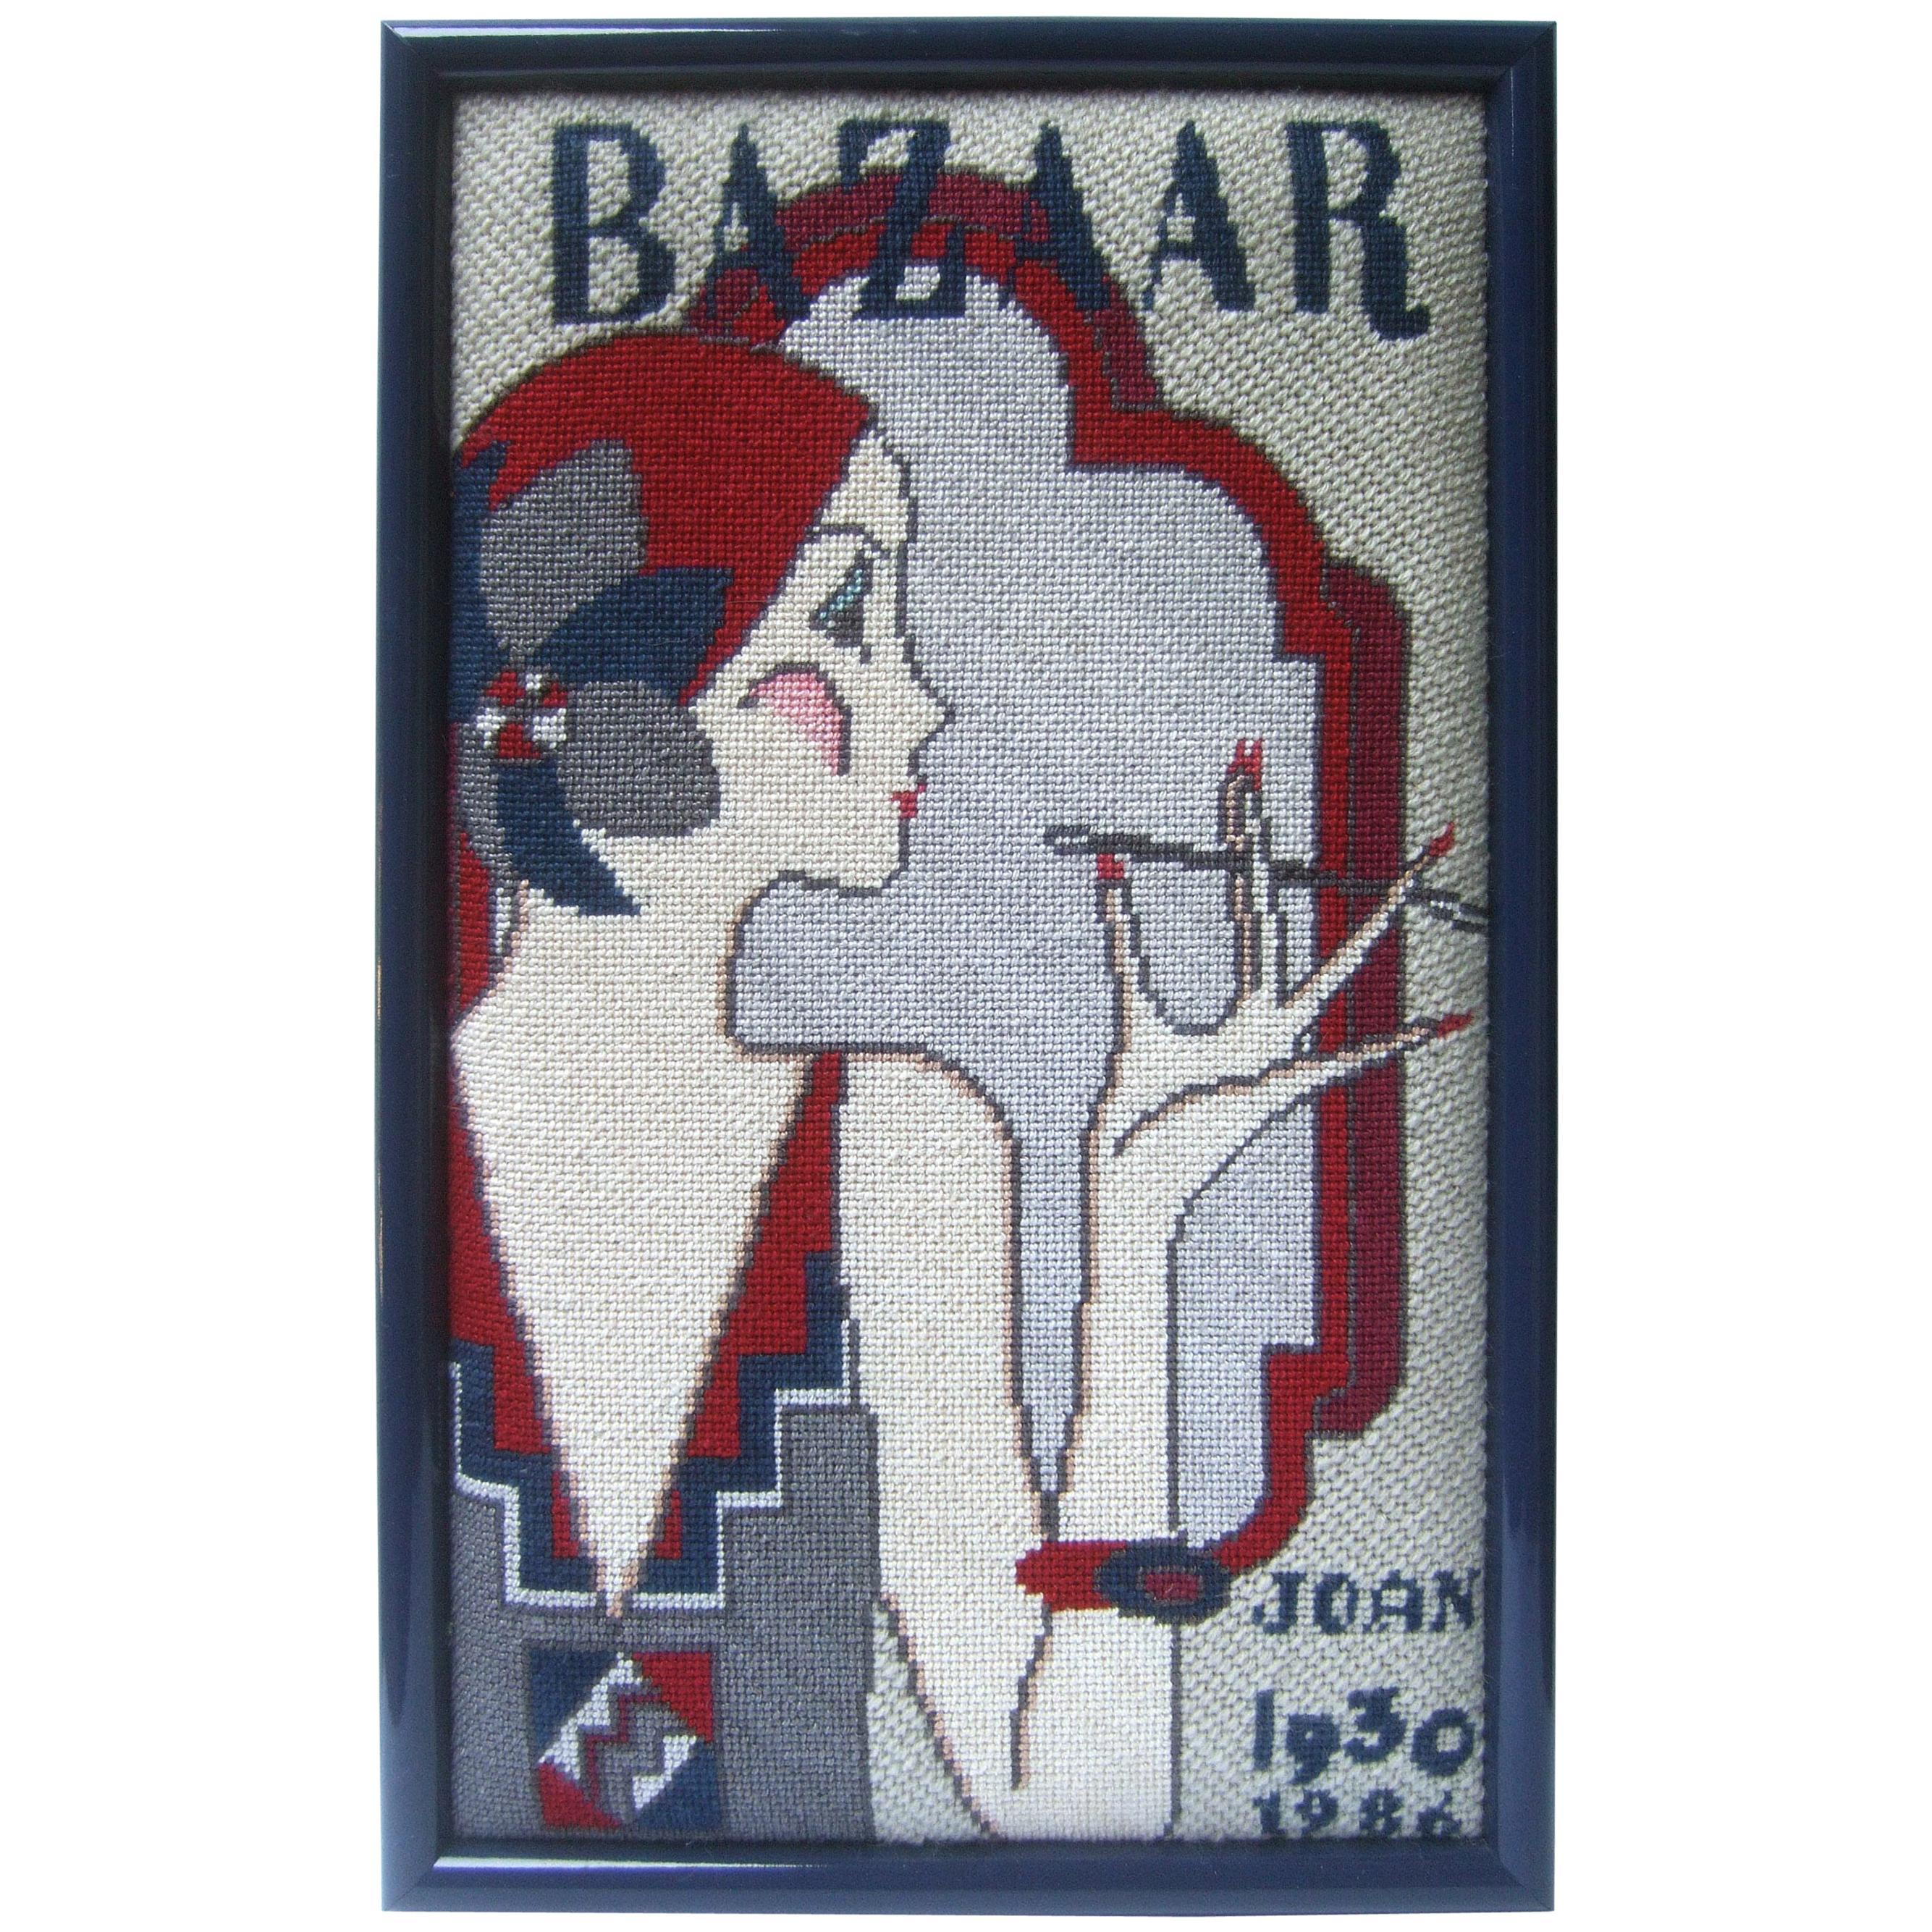 1970s Art Deco Inspired Framed Needlepoint Wall Hanging